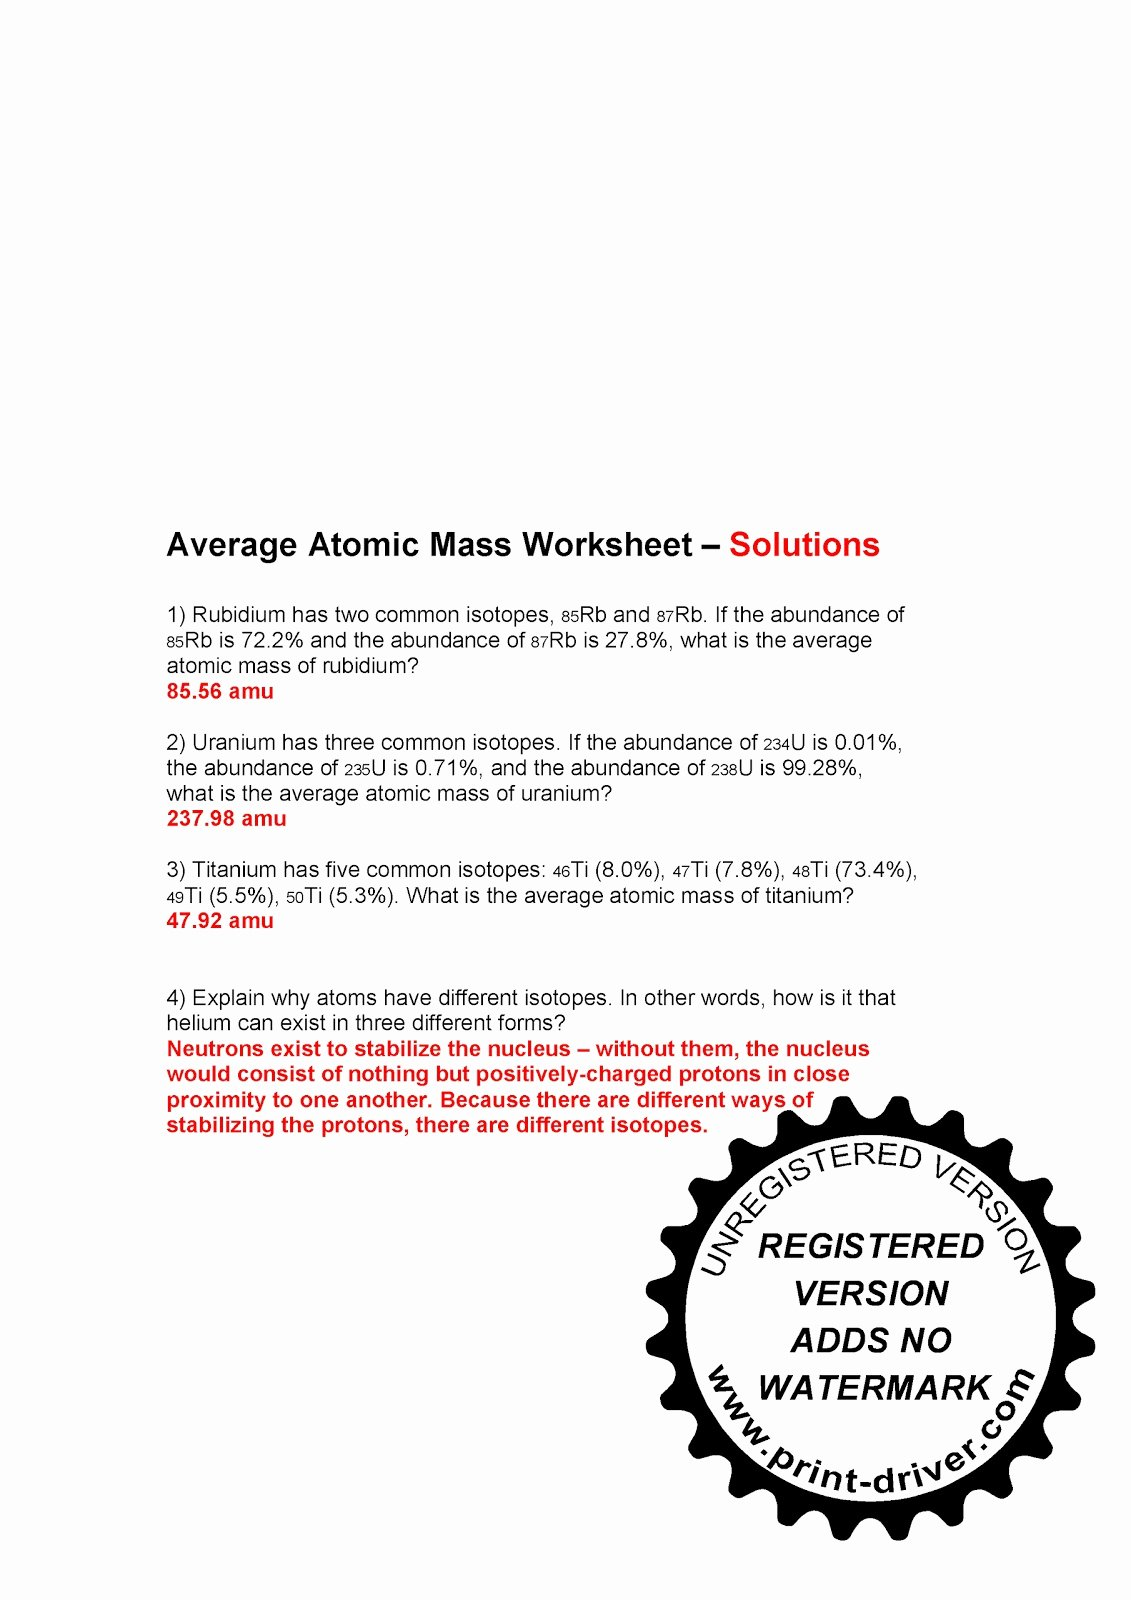 Average atomic Mass Worksheet Answers Best Of Mr Zehner S Chemistry Class November 2010